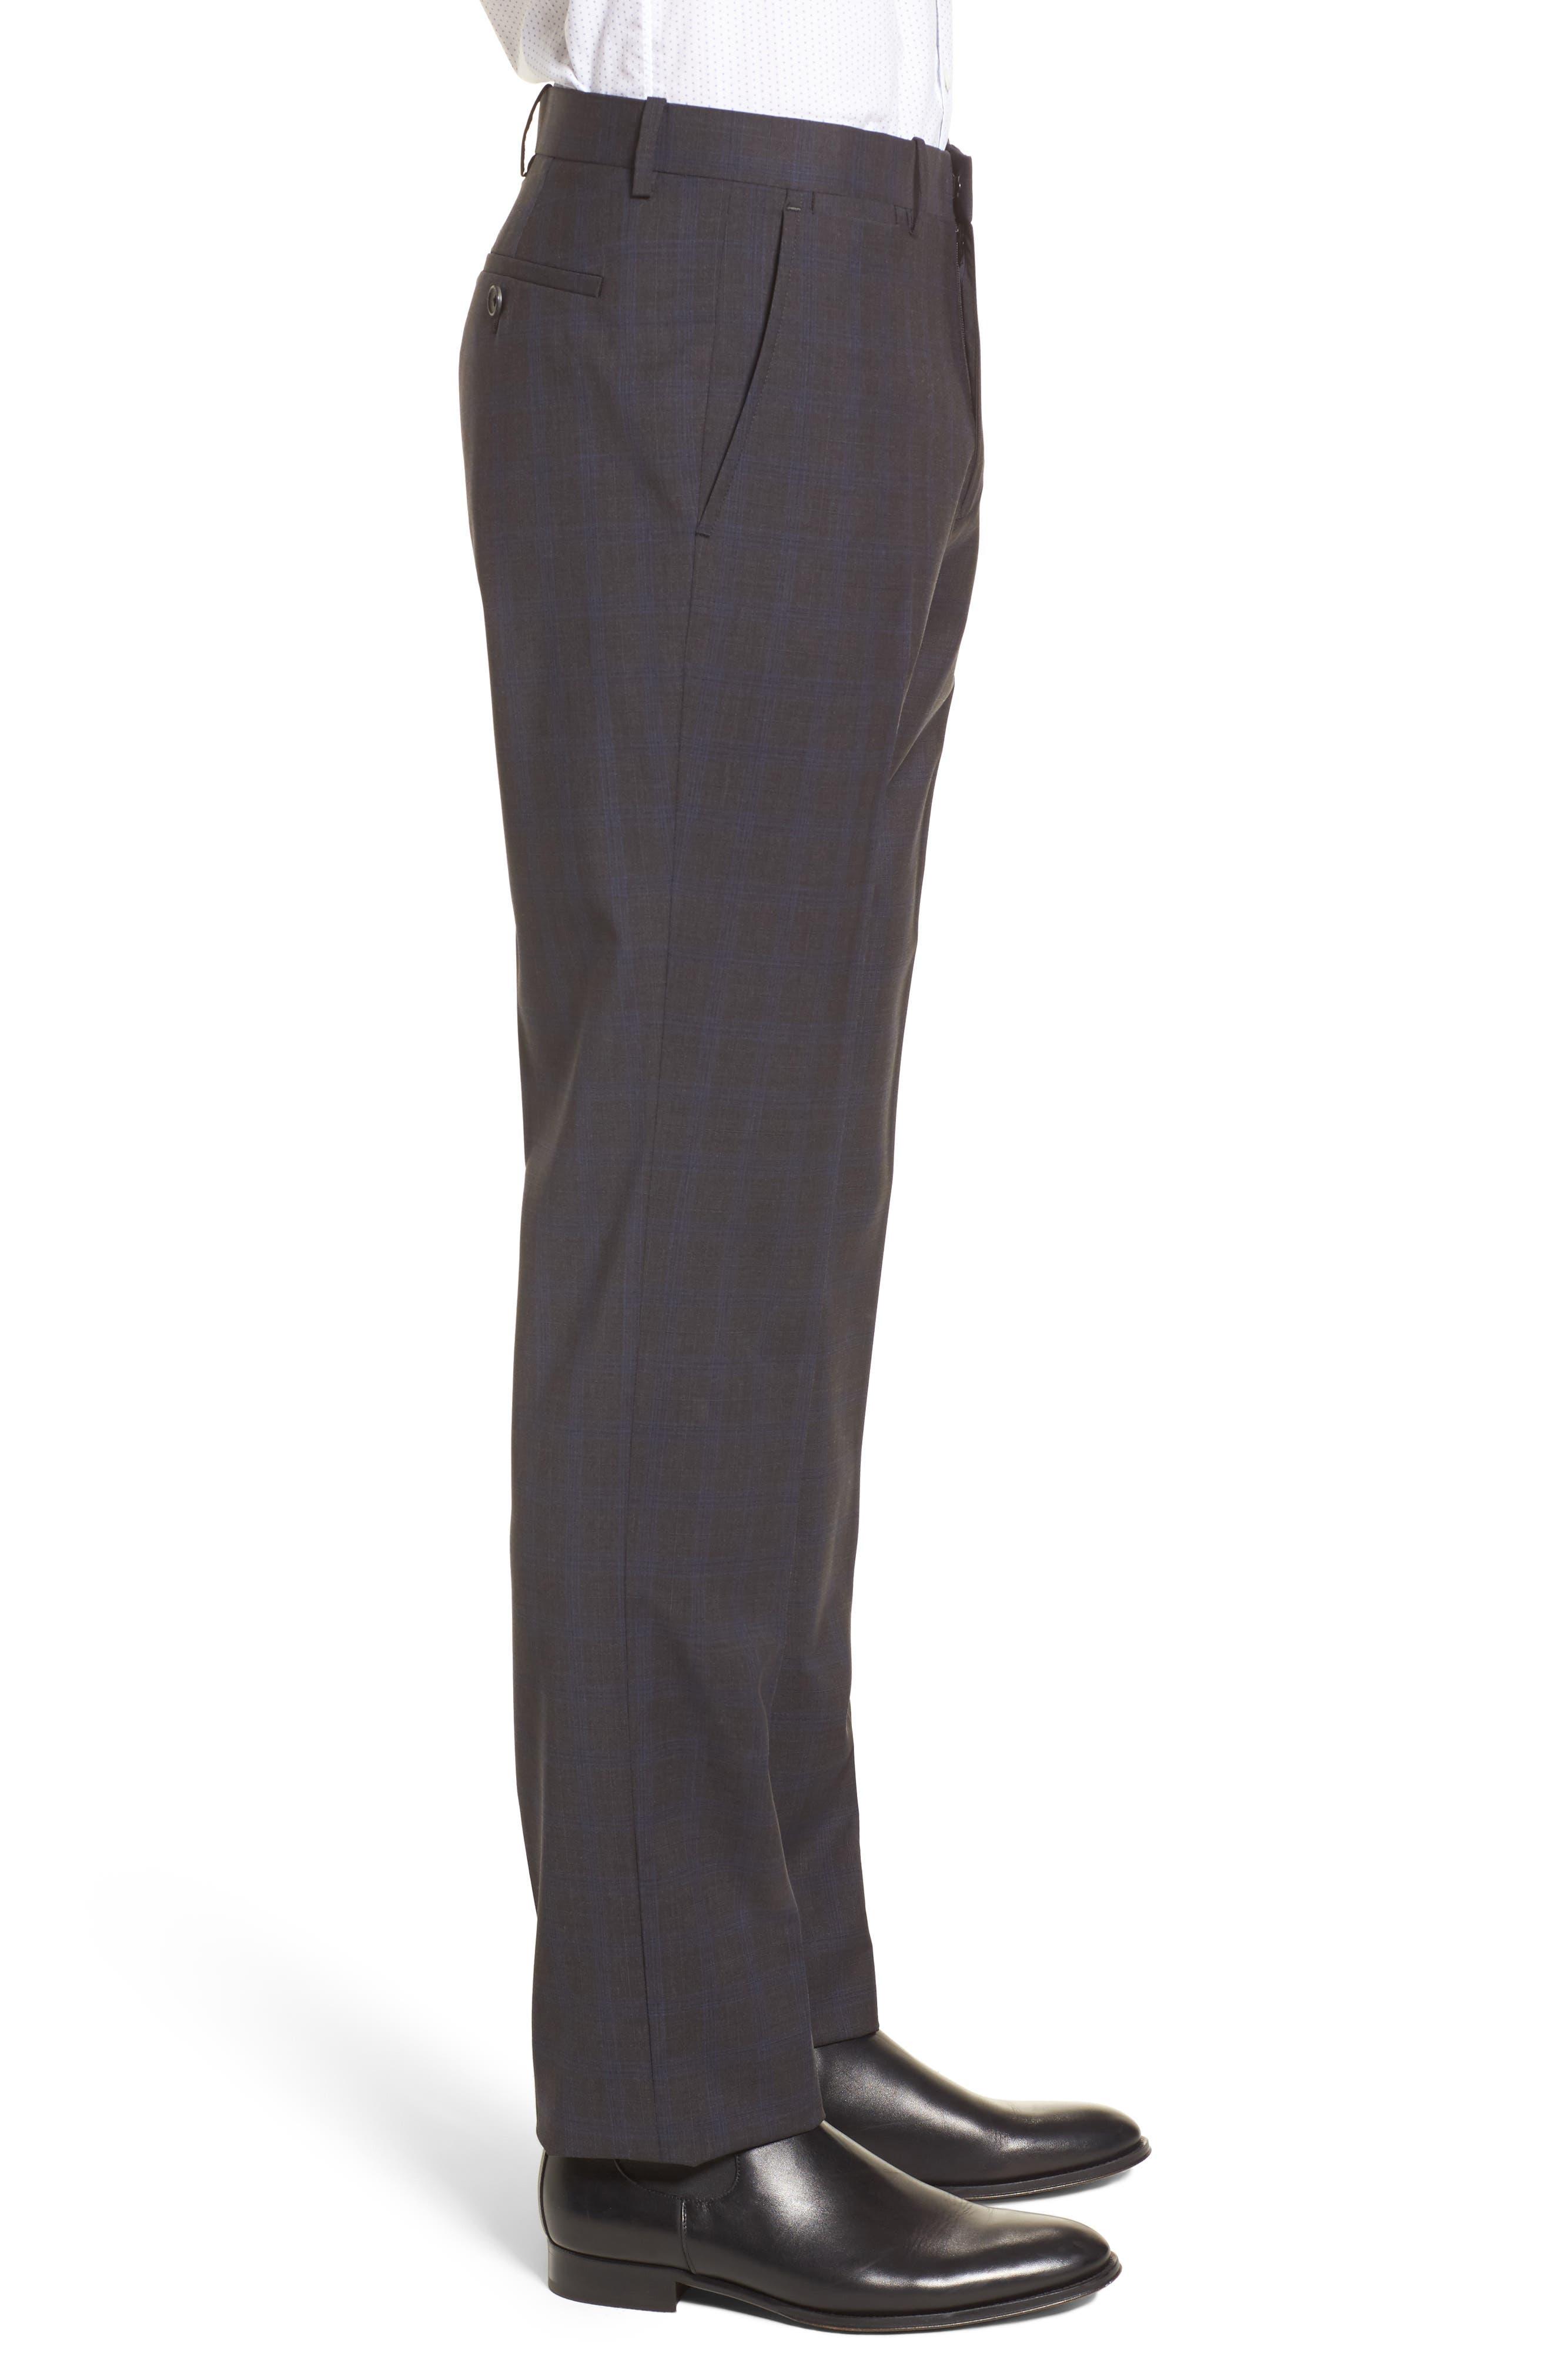 Marlo Trim Fit Tonal Plaid Trousers,                             Alternate thumbnail 3, color,                             053